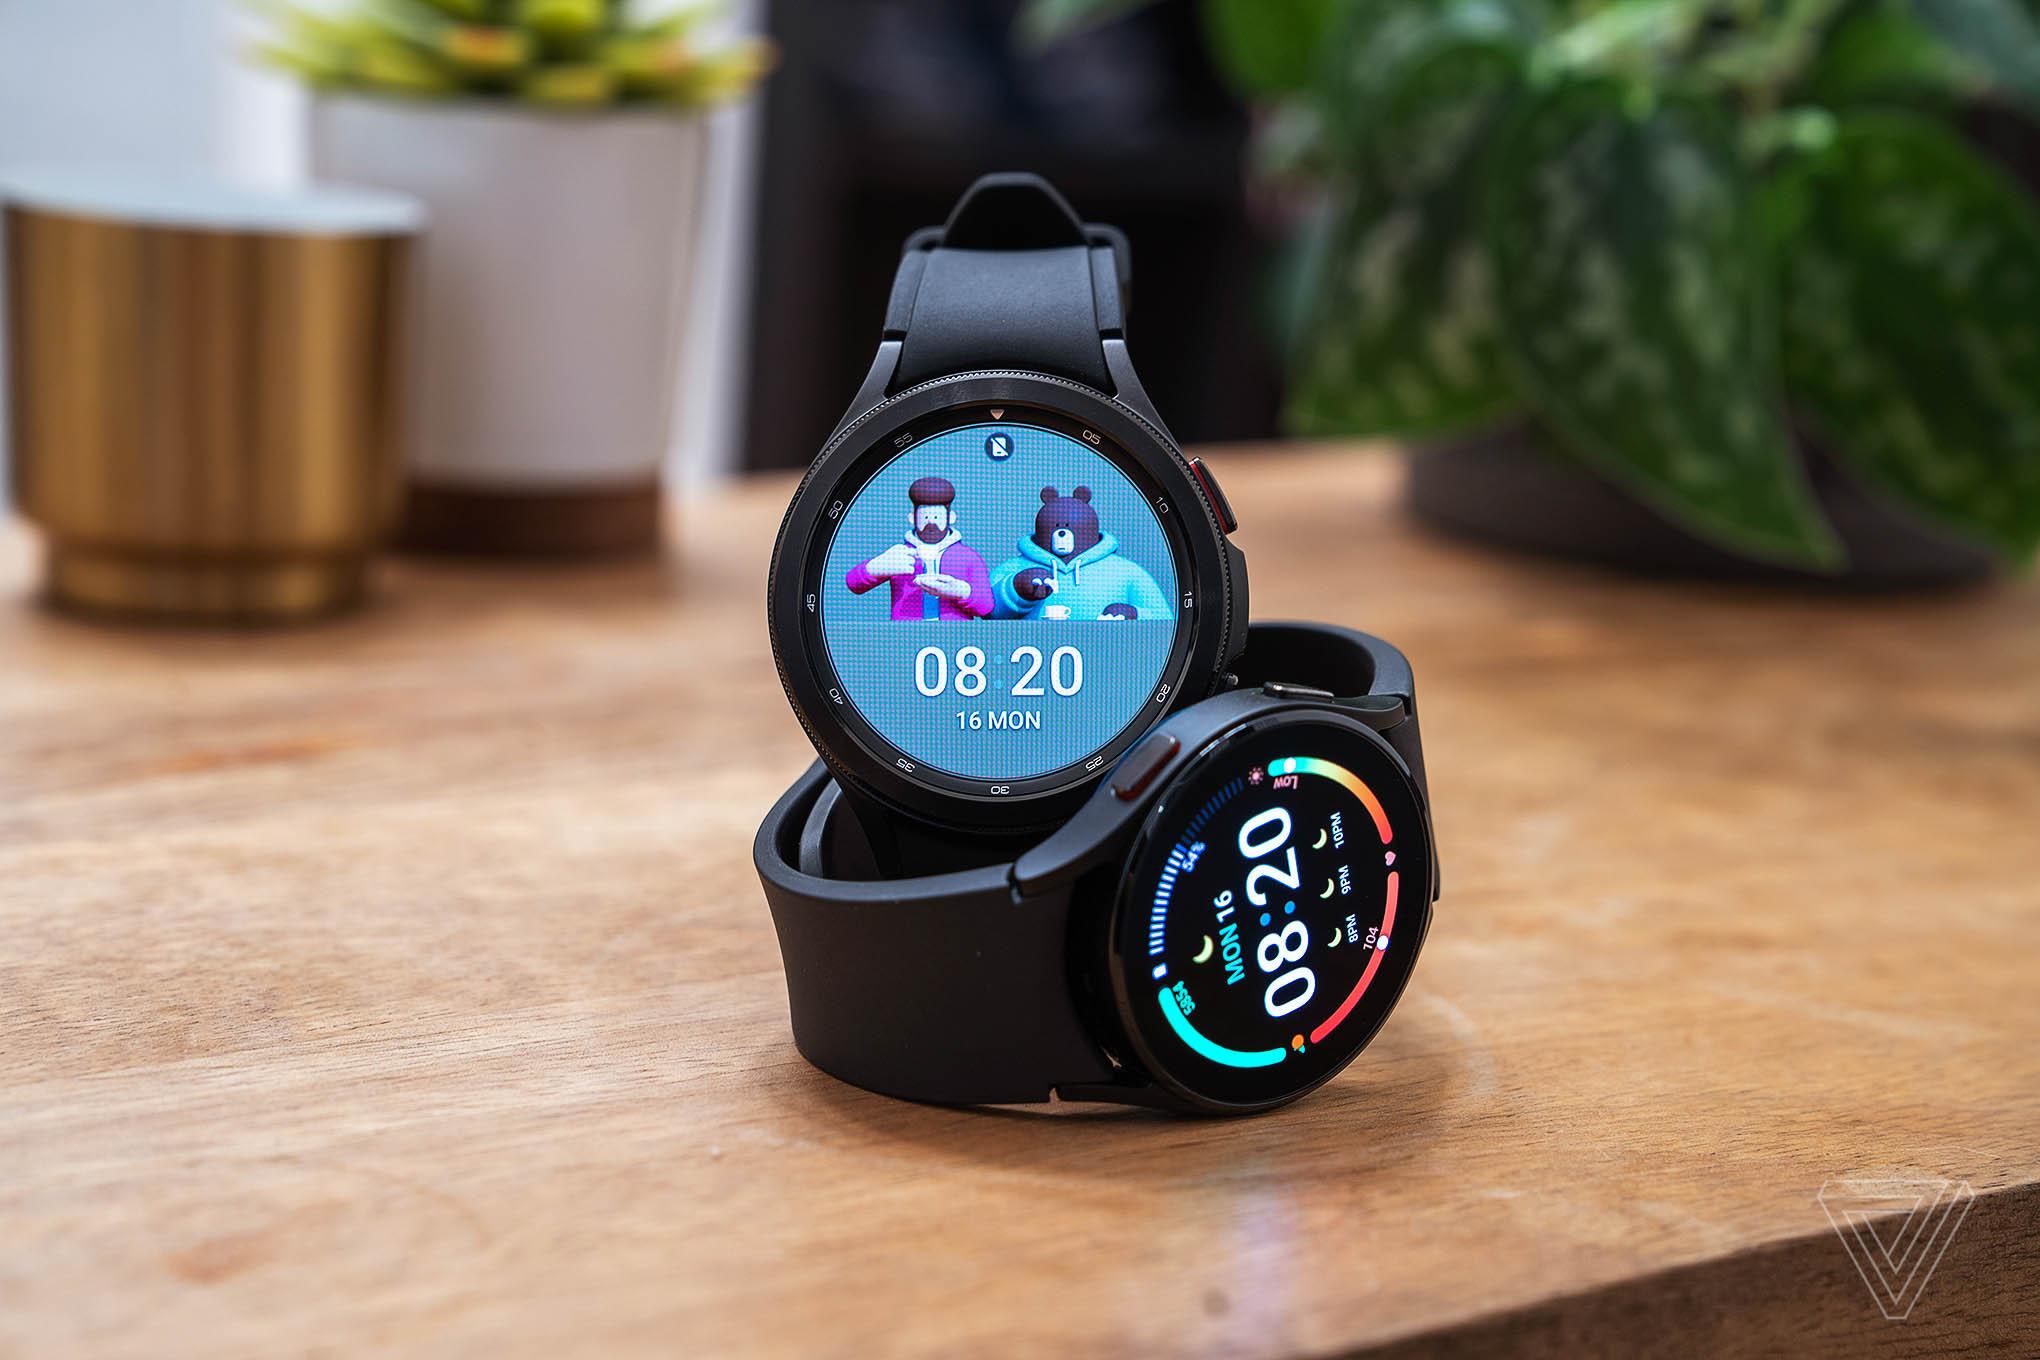 The Galaxy Watch 4 Classic and Galaxy Watch 4